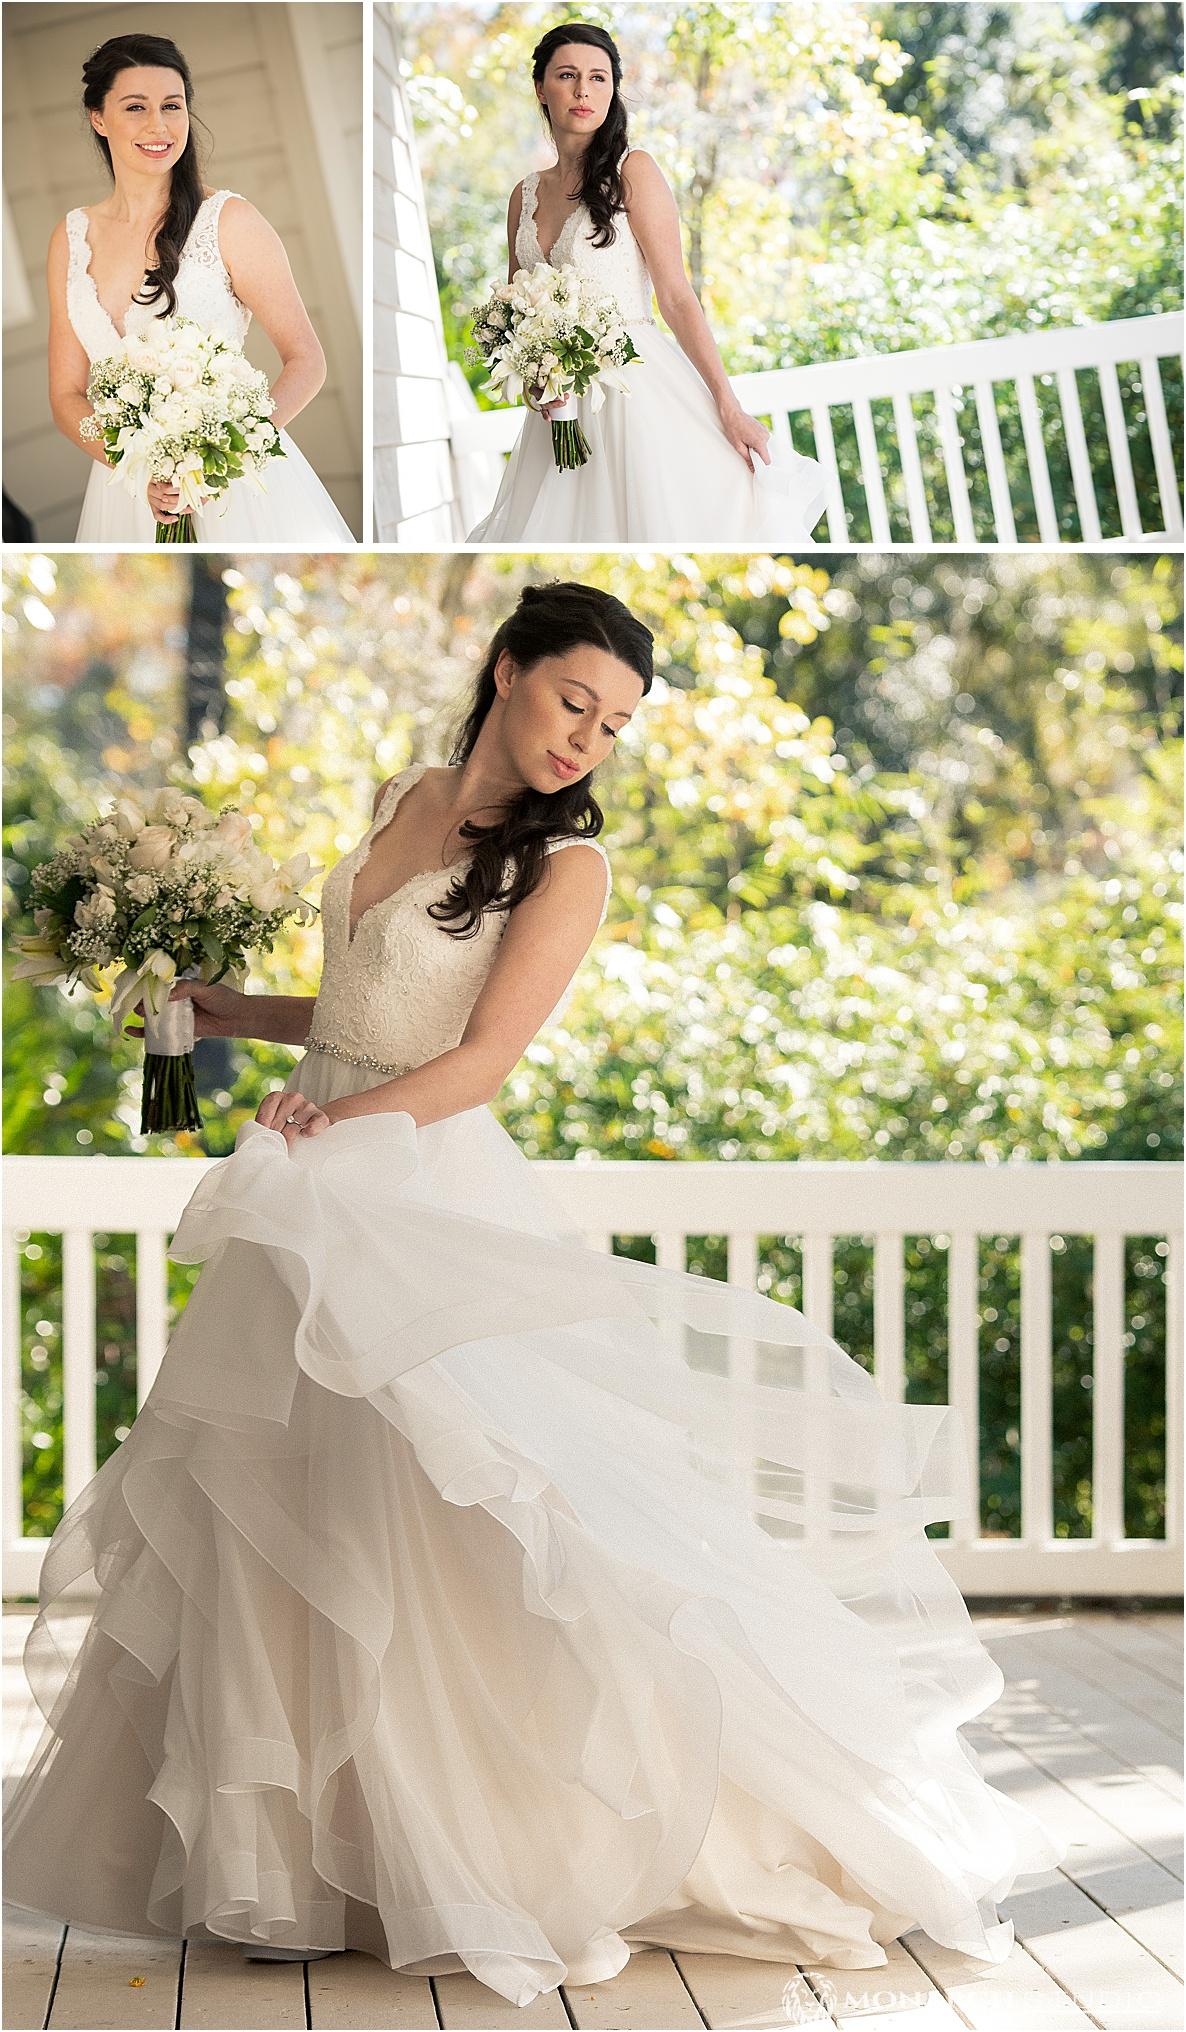 Wedding-photographer-in-sanford-florida-natural-wedding-012.jpg